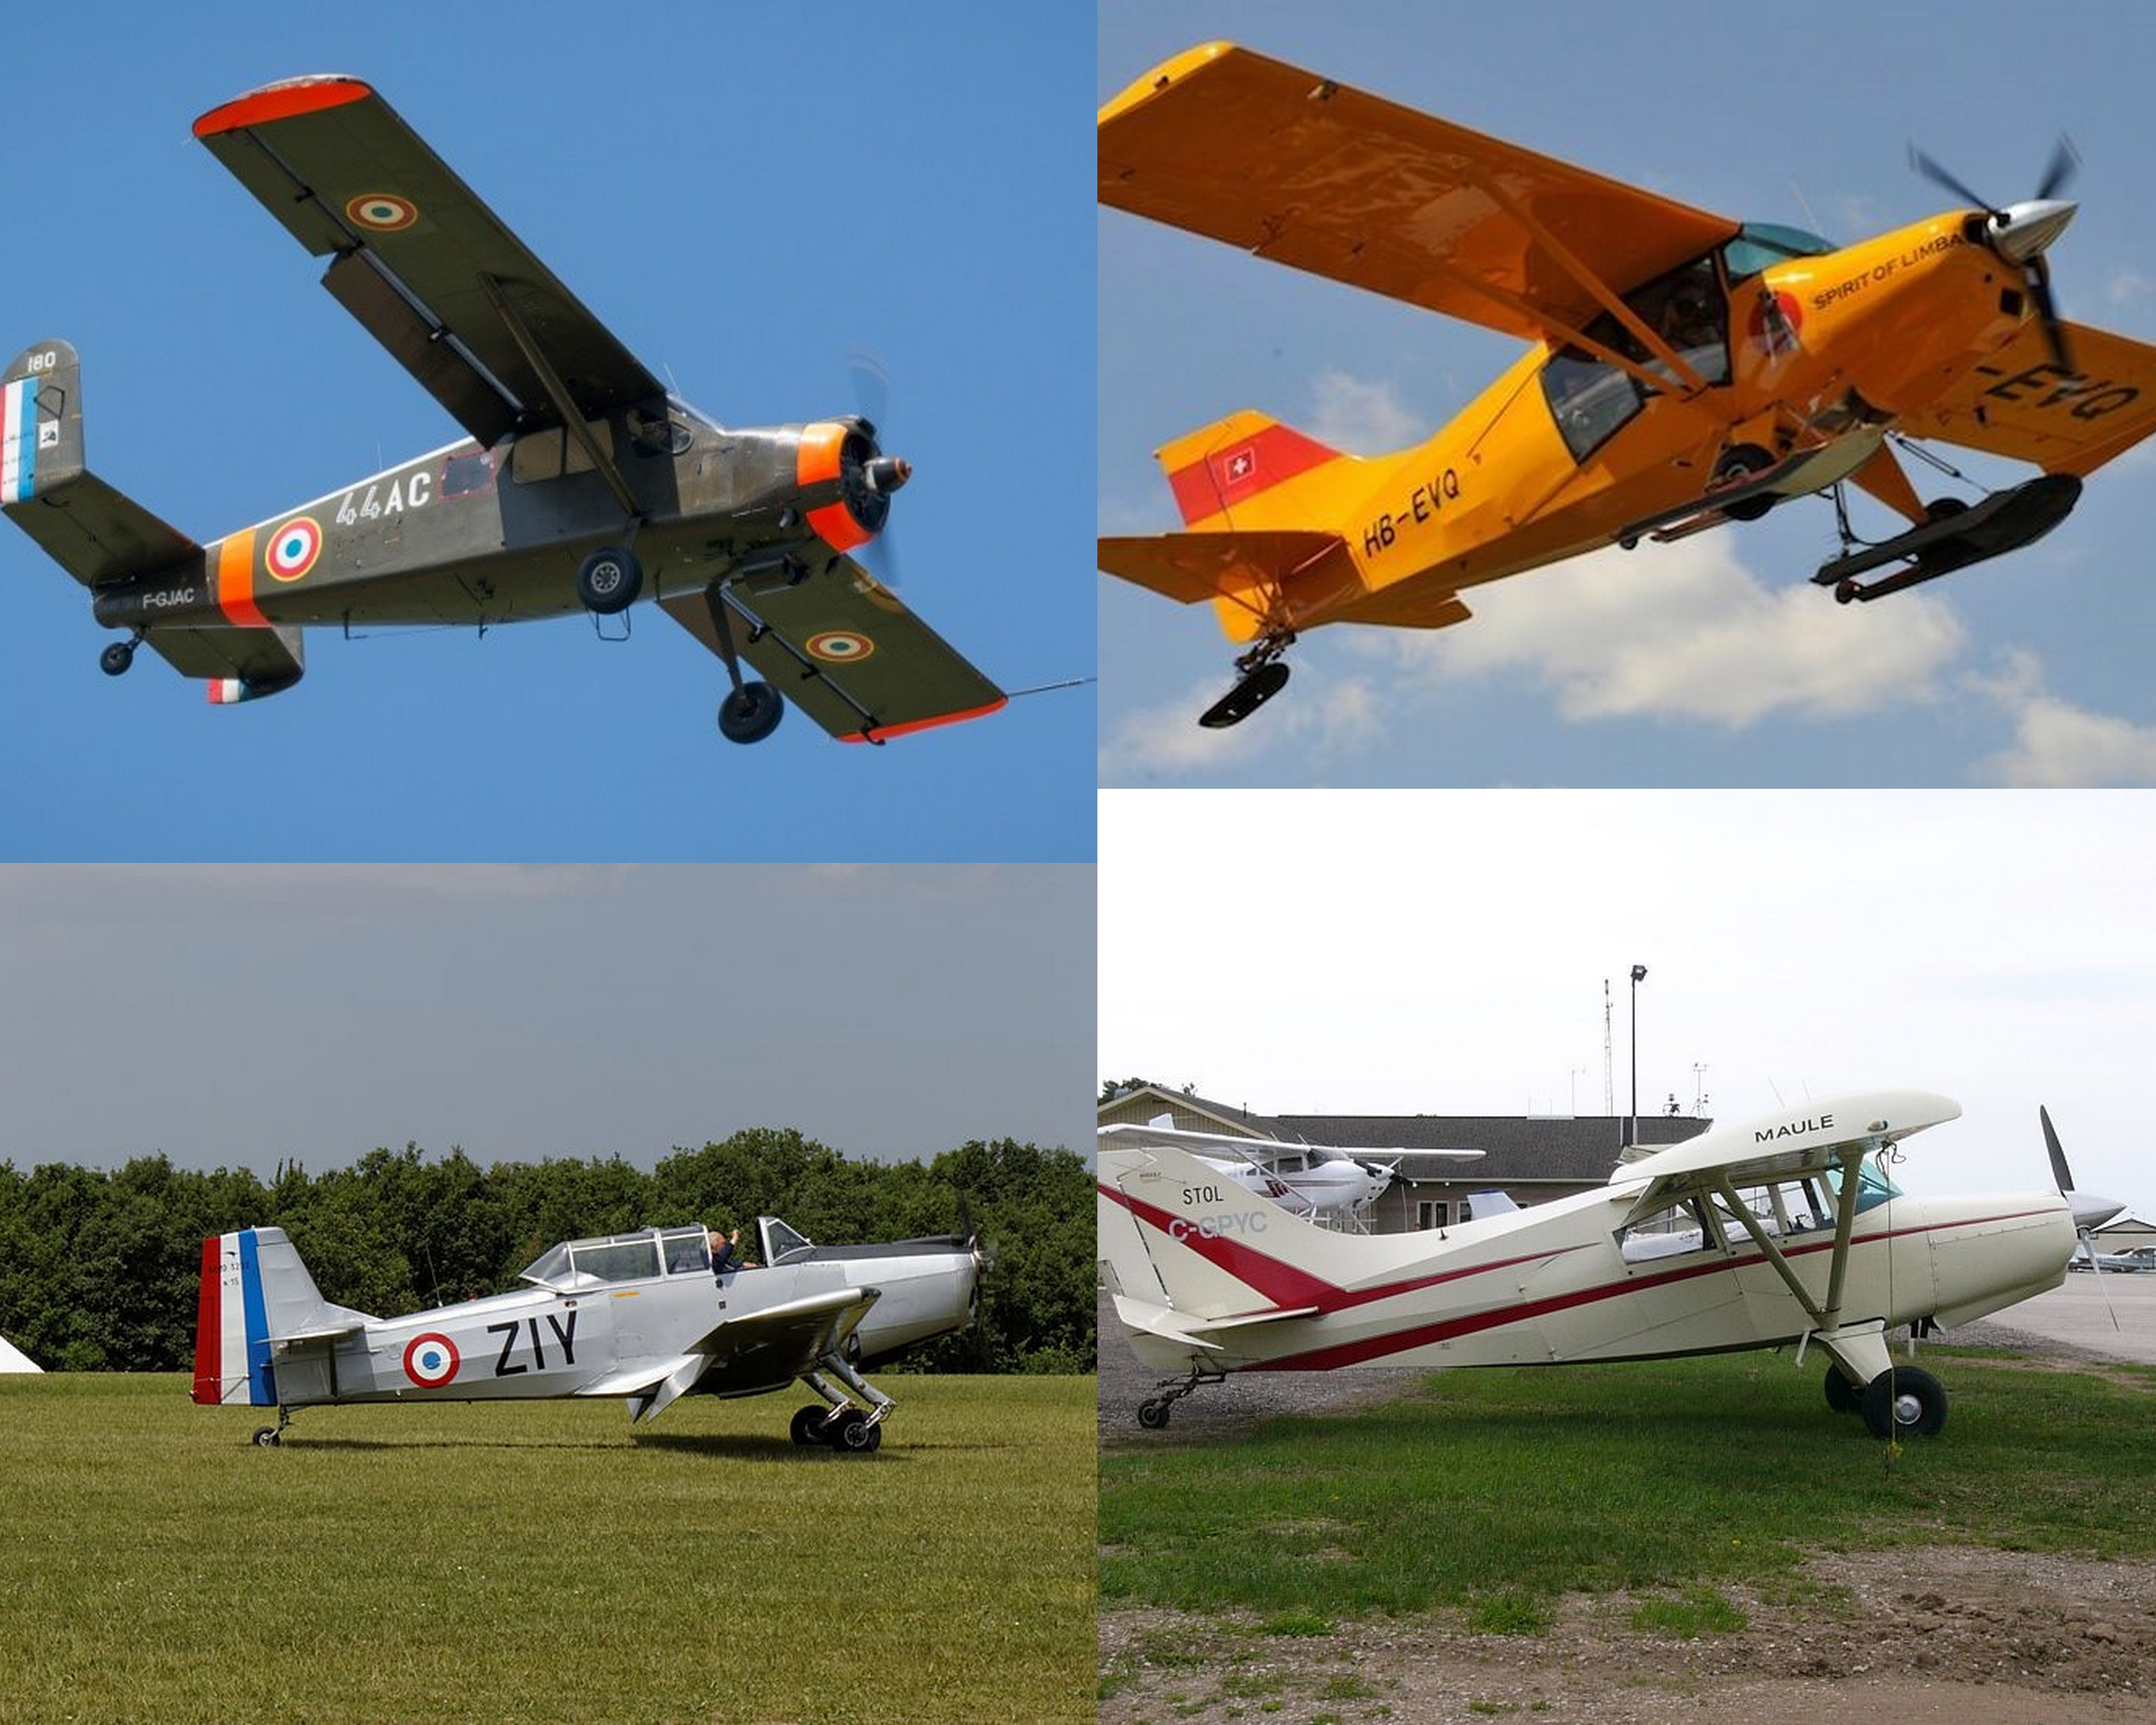 Mainfonds-Aubeville Airport